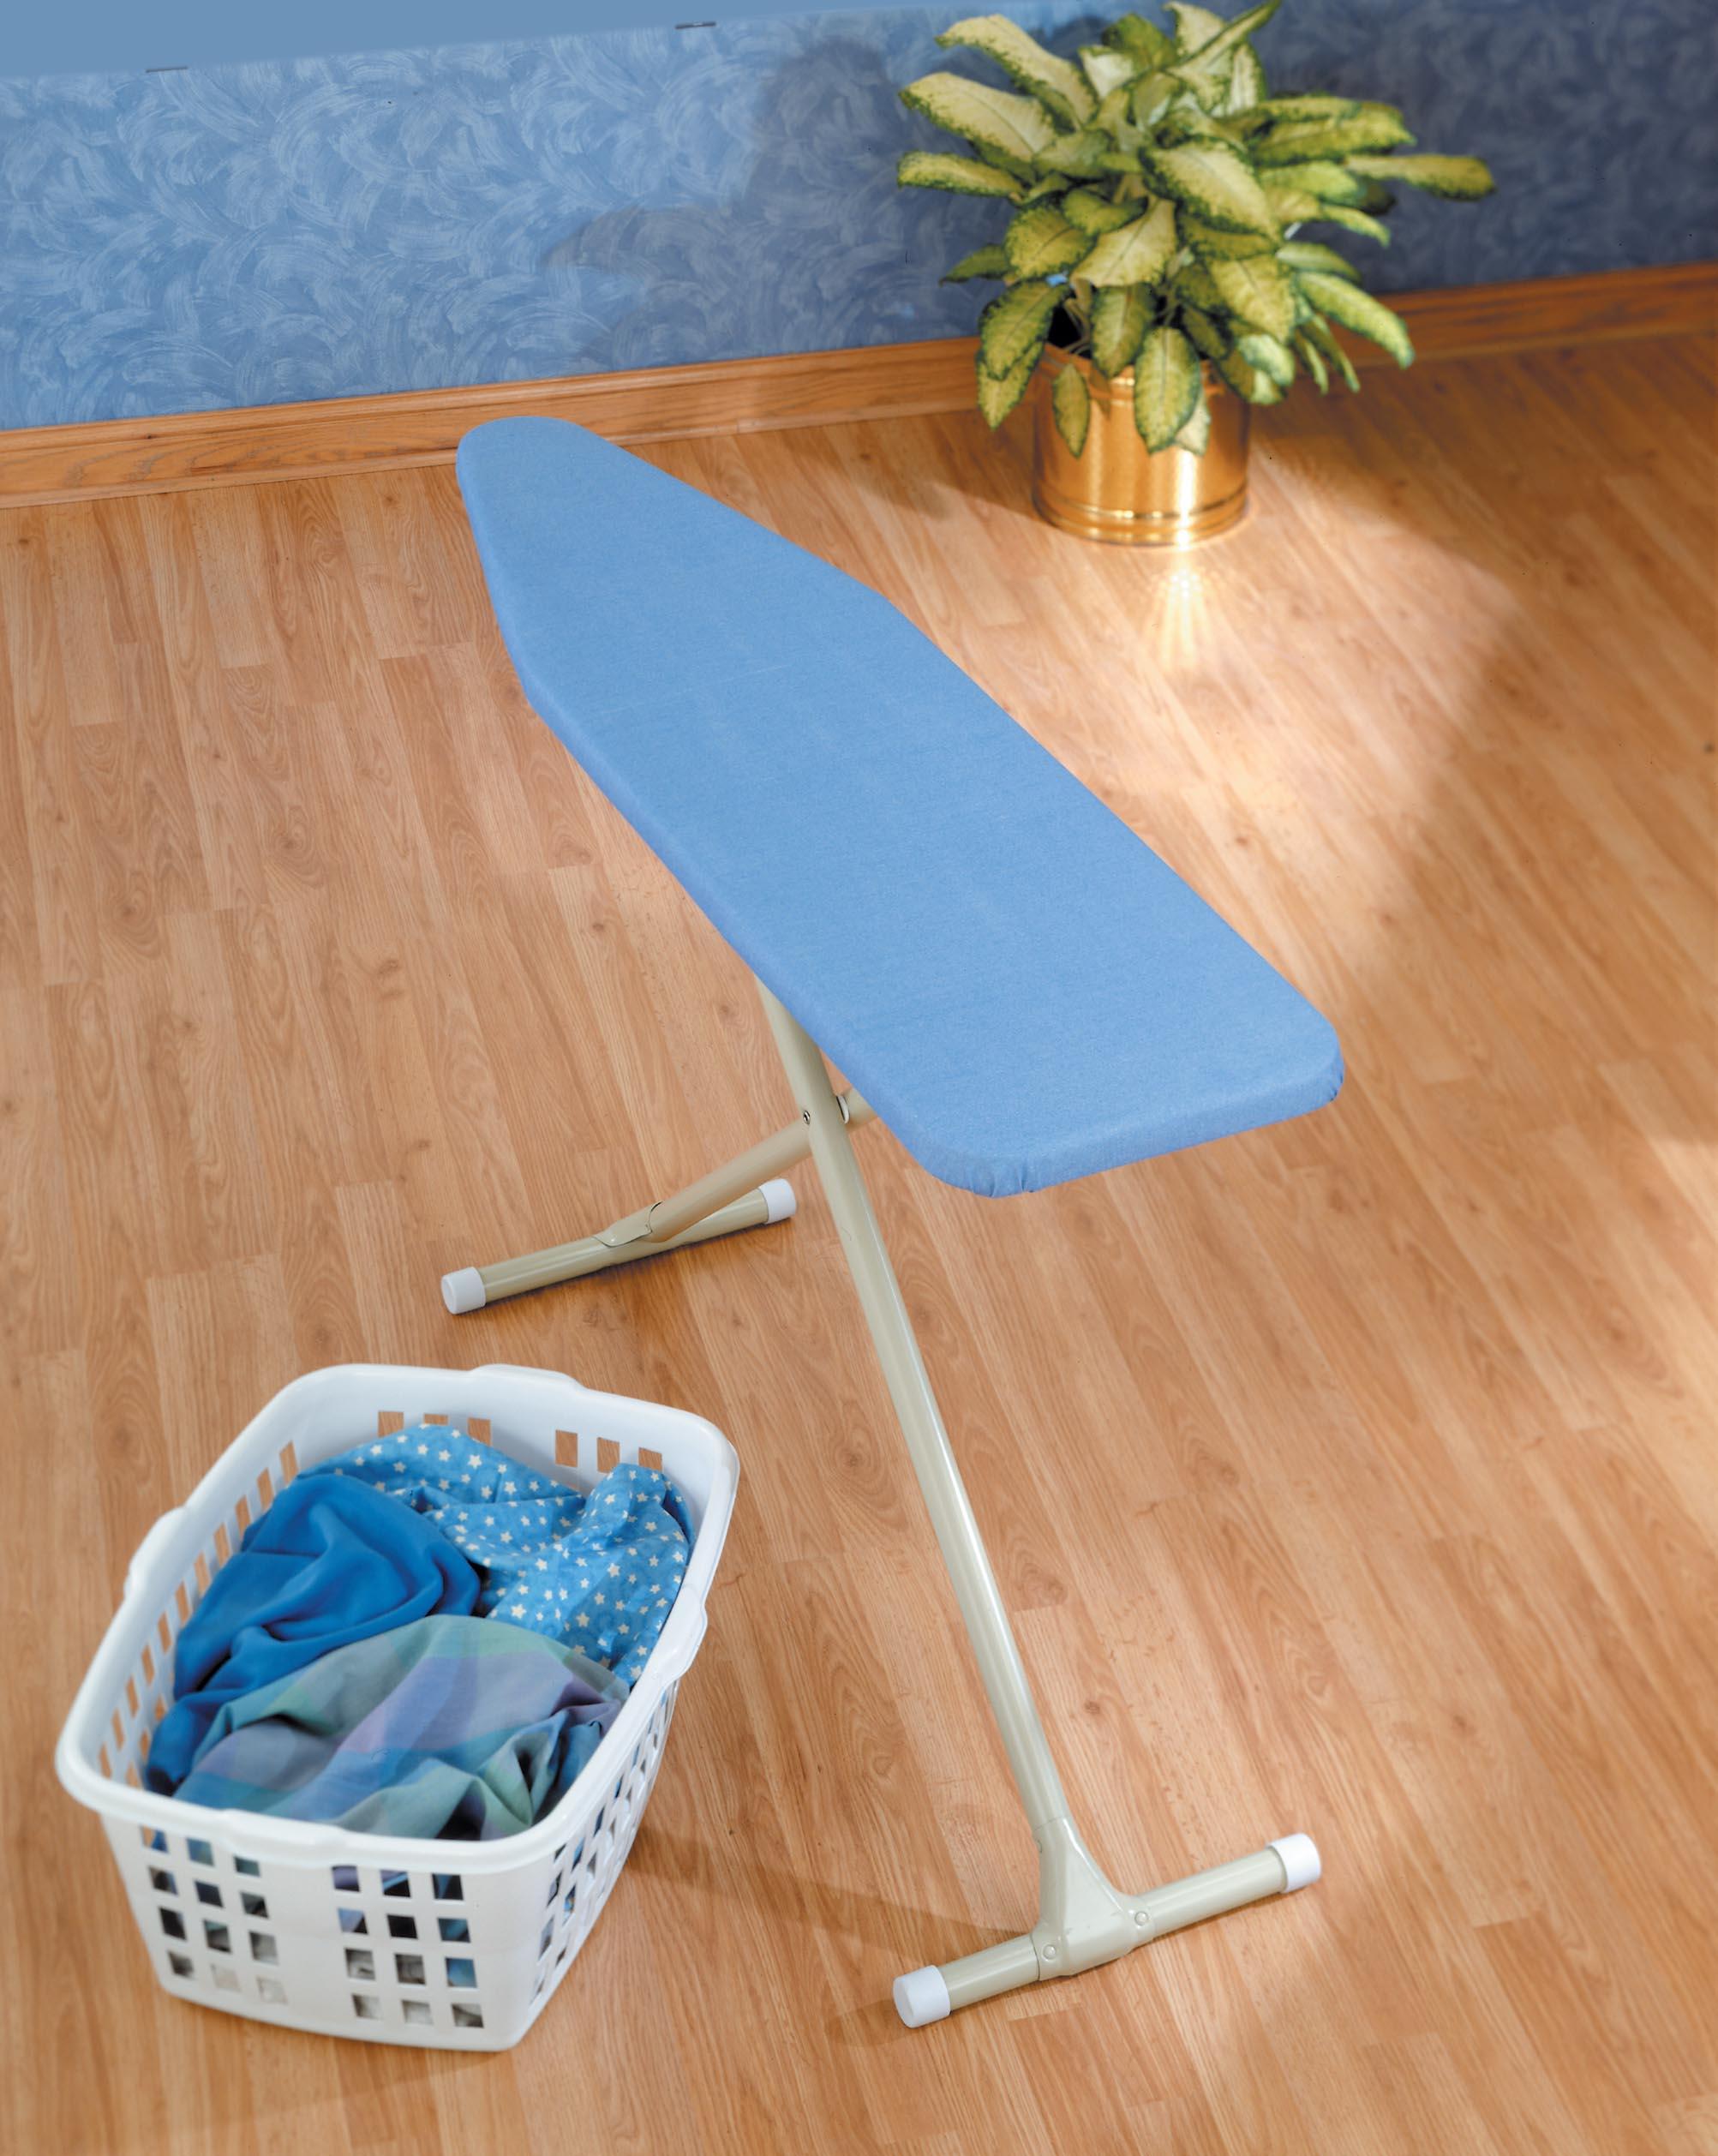 homz hotel ironing board by hospitality america